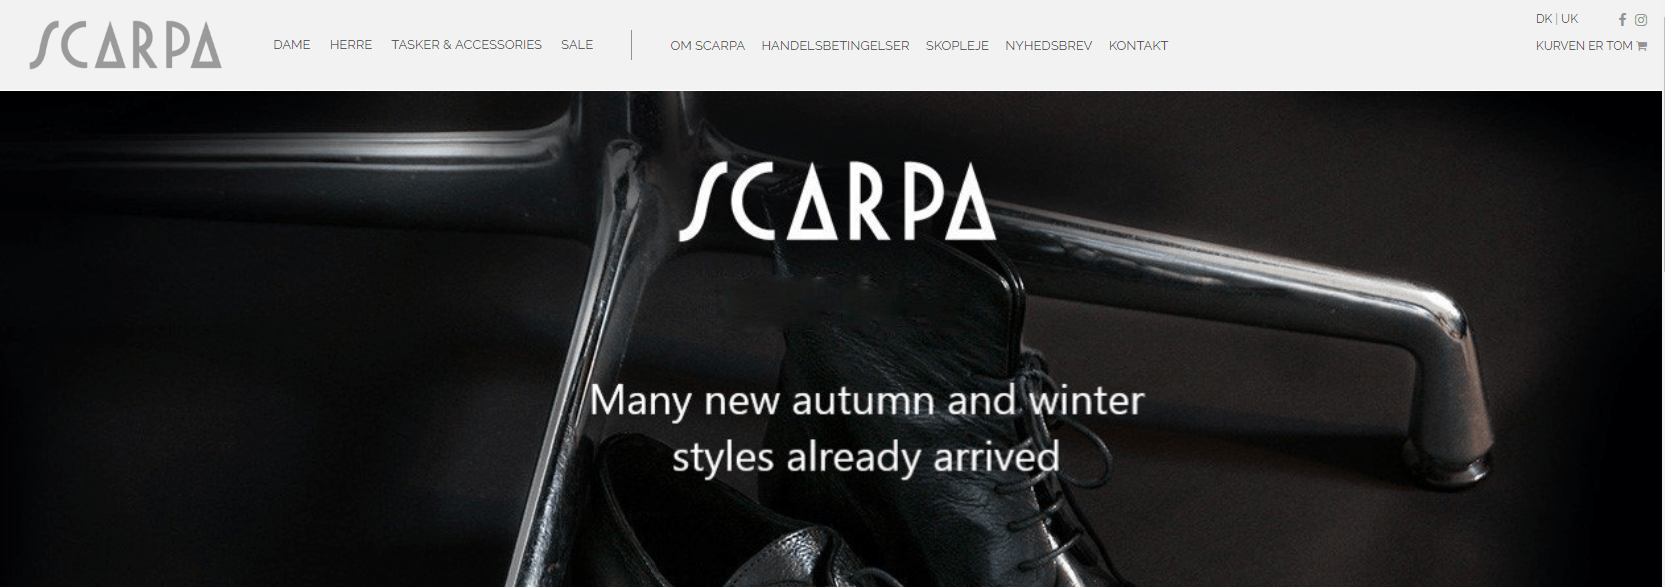 Scarpa.png